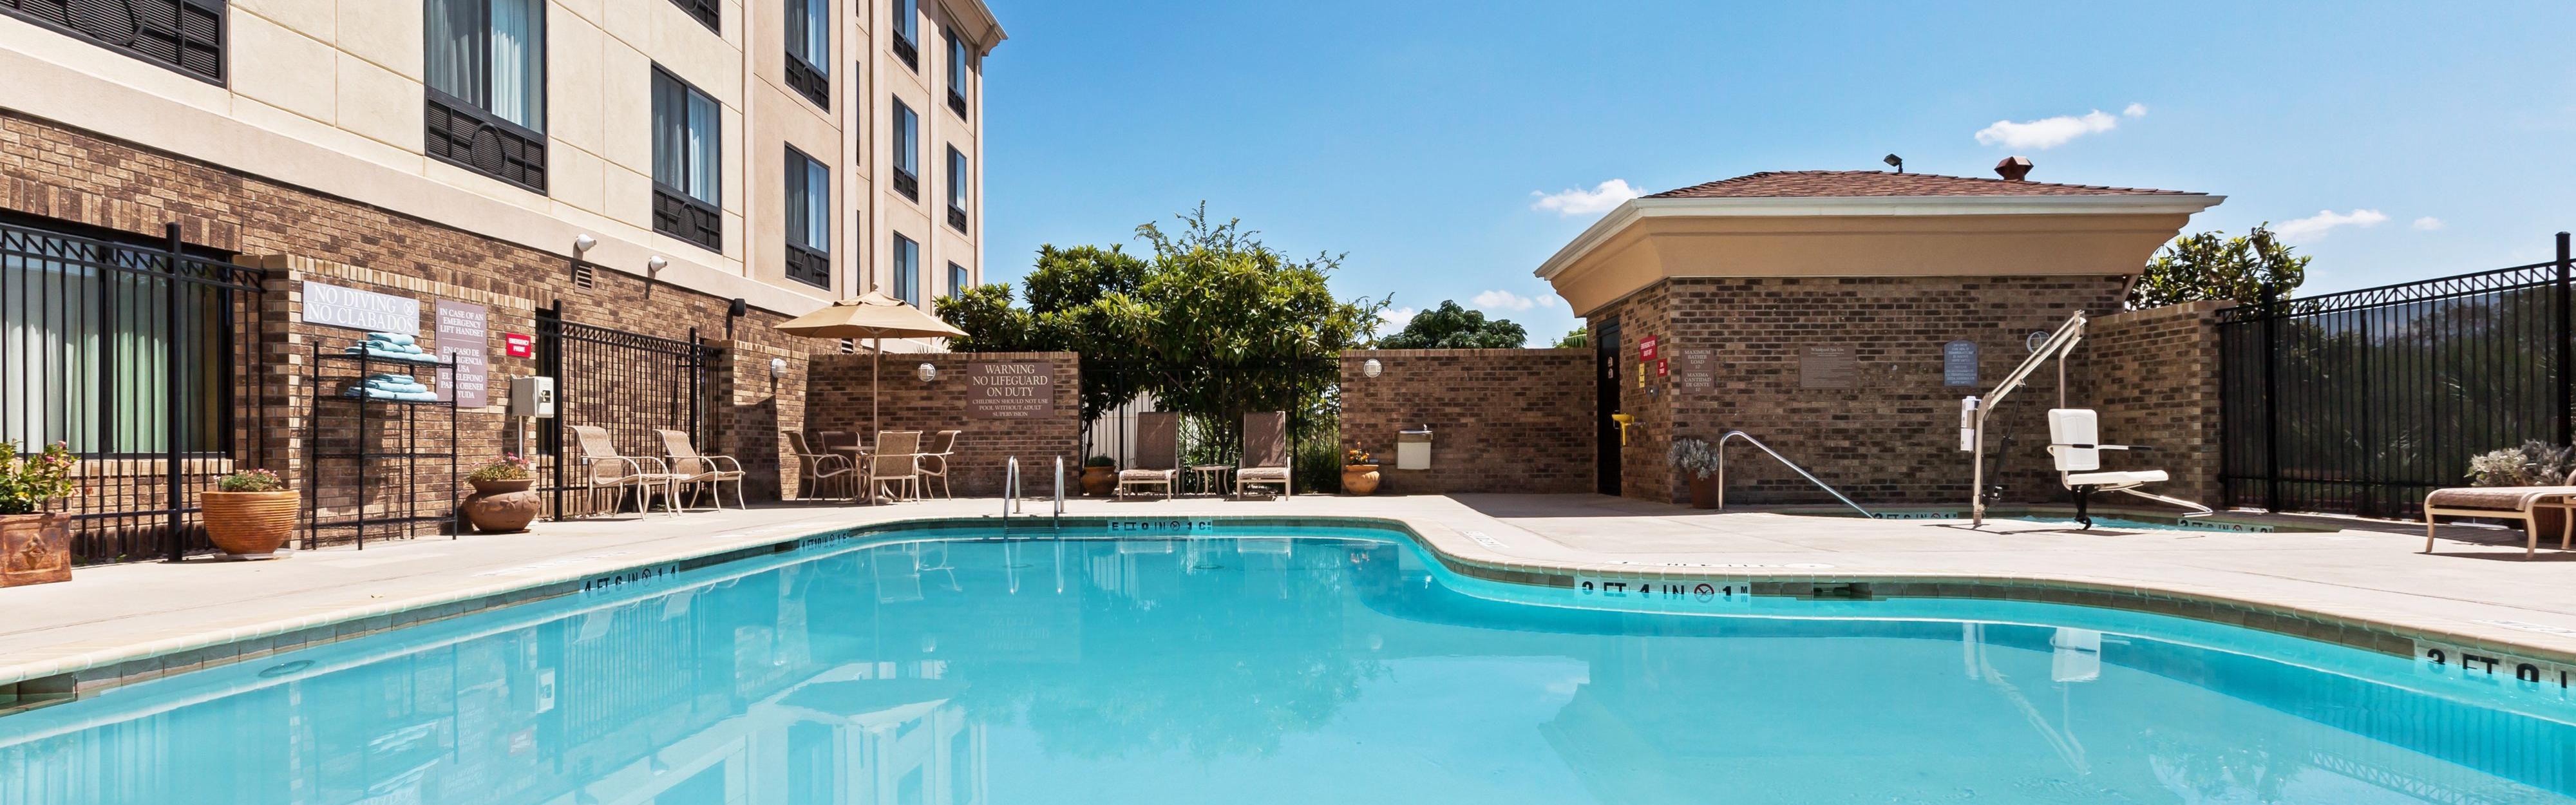 Holiday Inn Express Amp Suites Selma Selma Texas Tx